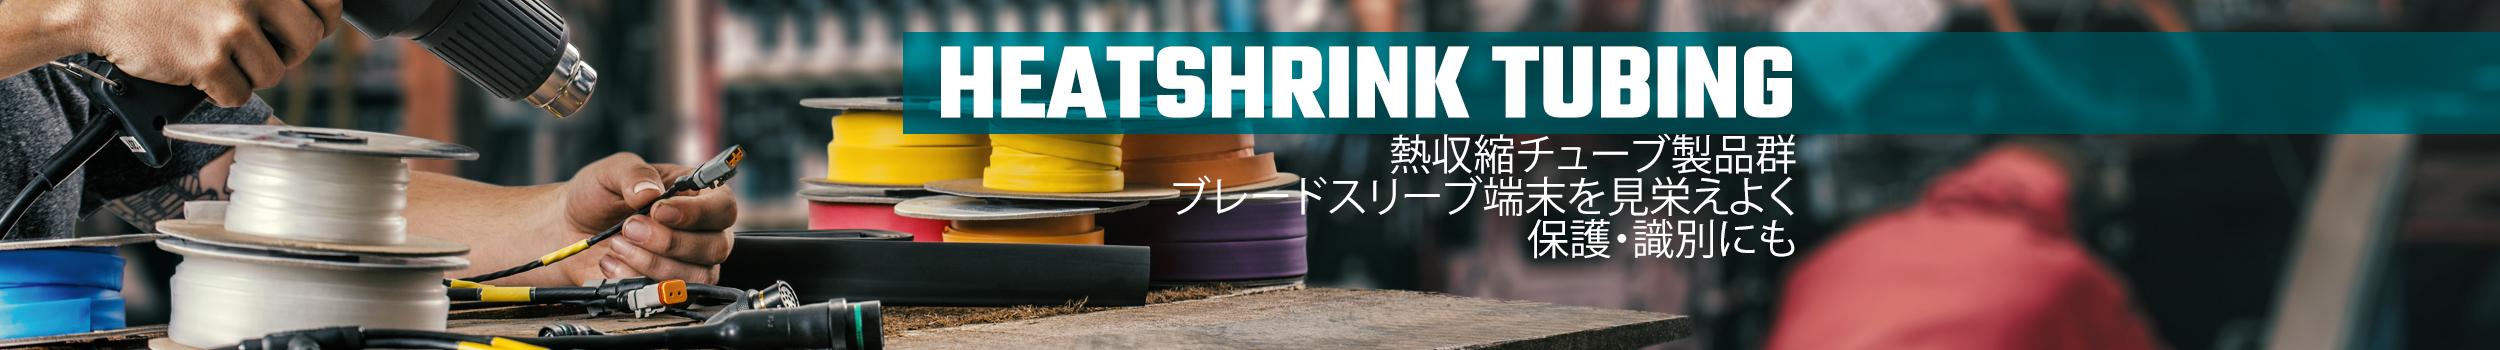 Heatshrink banner jp